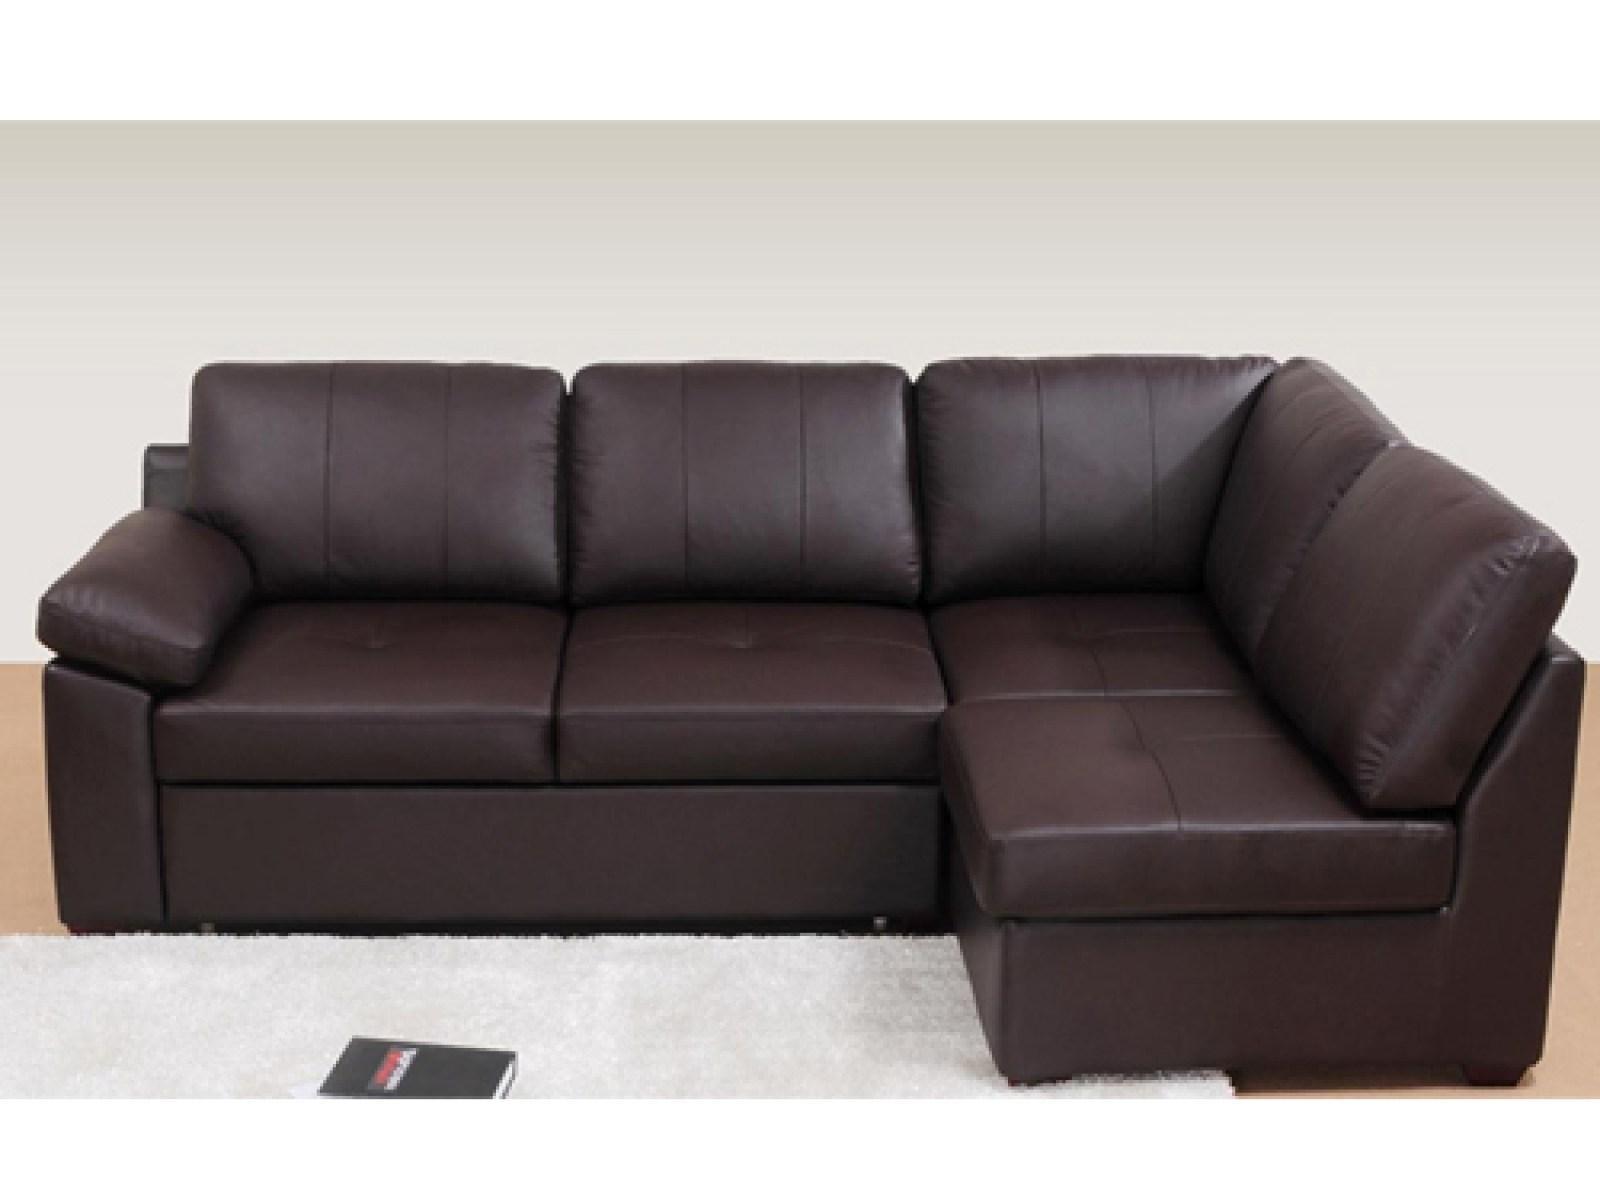 ▻ Sofa : 8 Leather Corner Sofa Bed Wonderful Leather Corner Sofa In Corner Sofa Bed Sale (View 12 of 20)